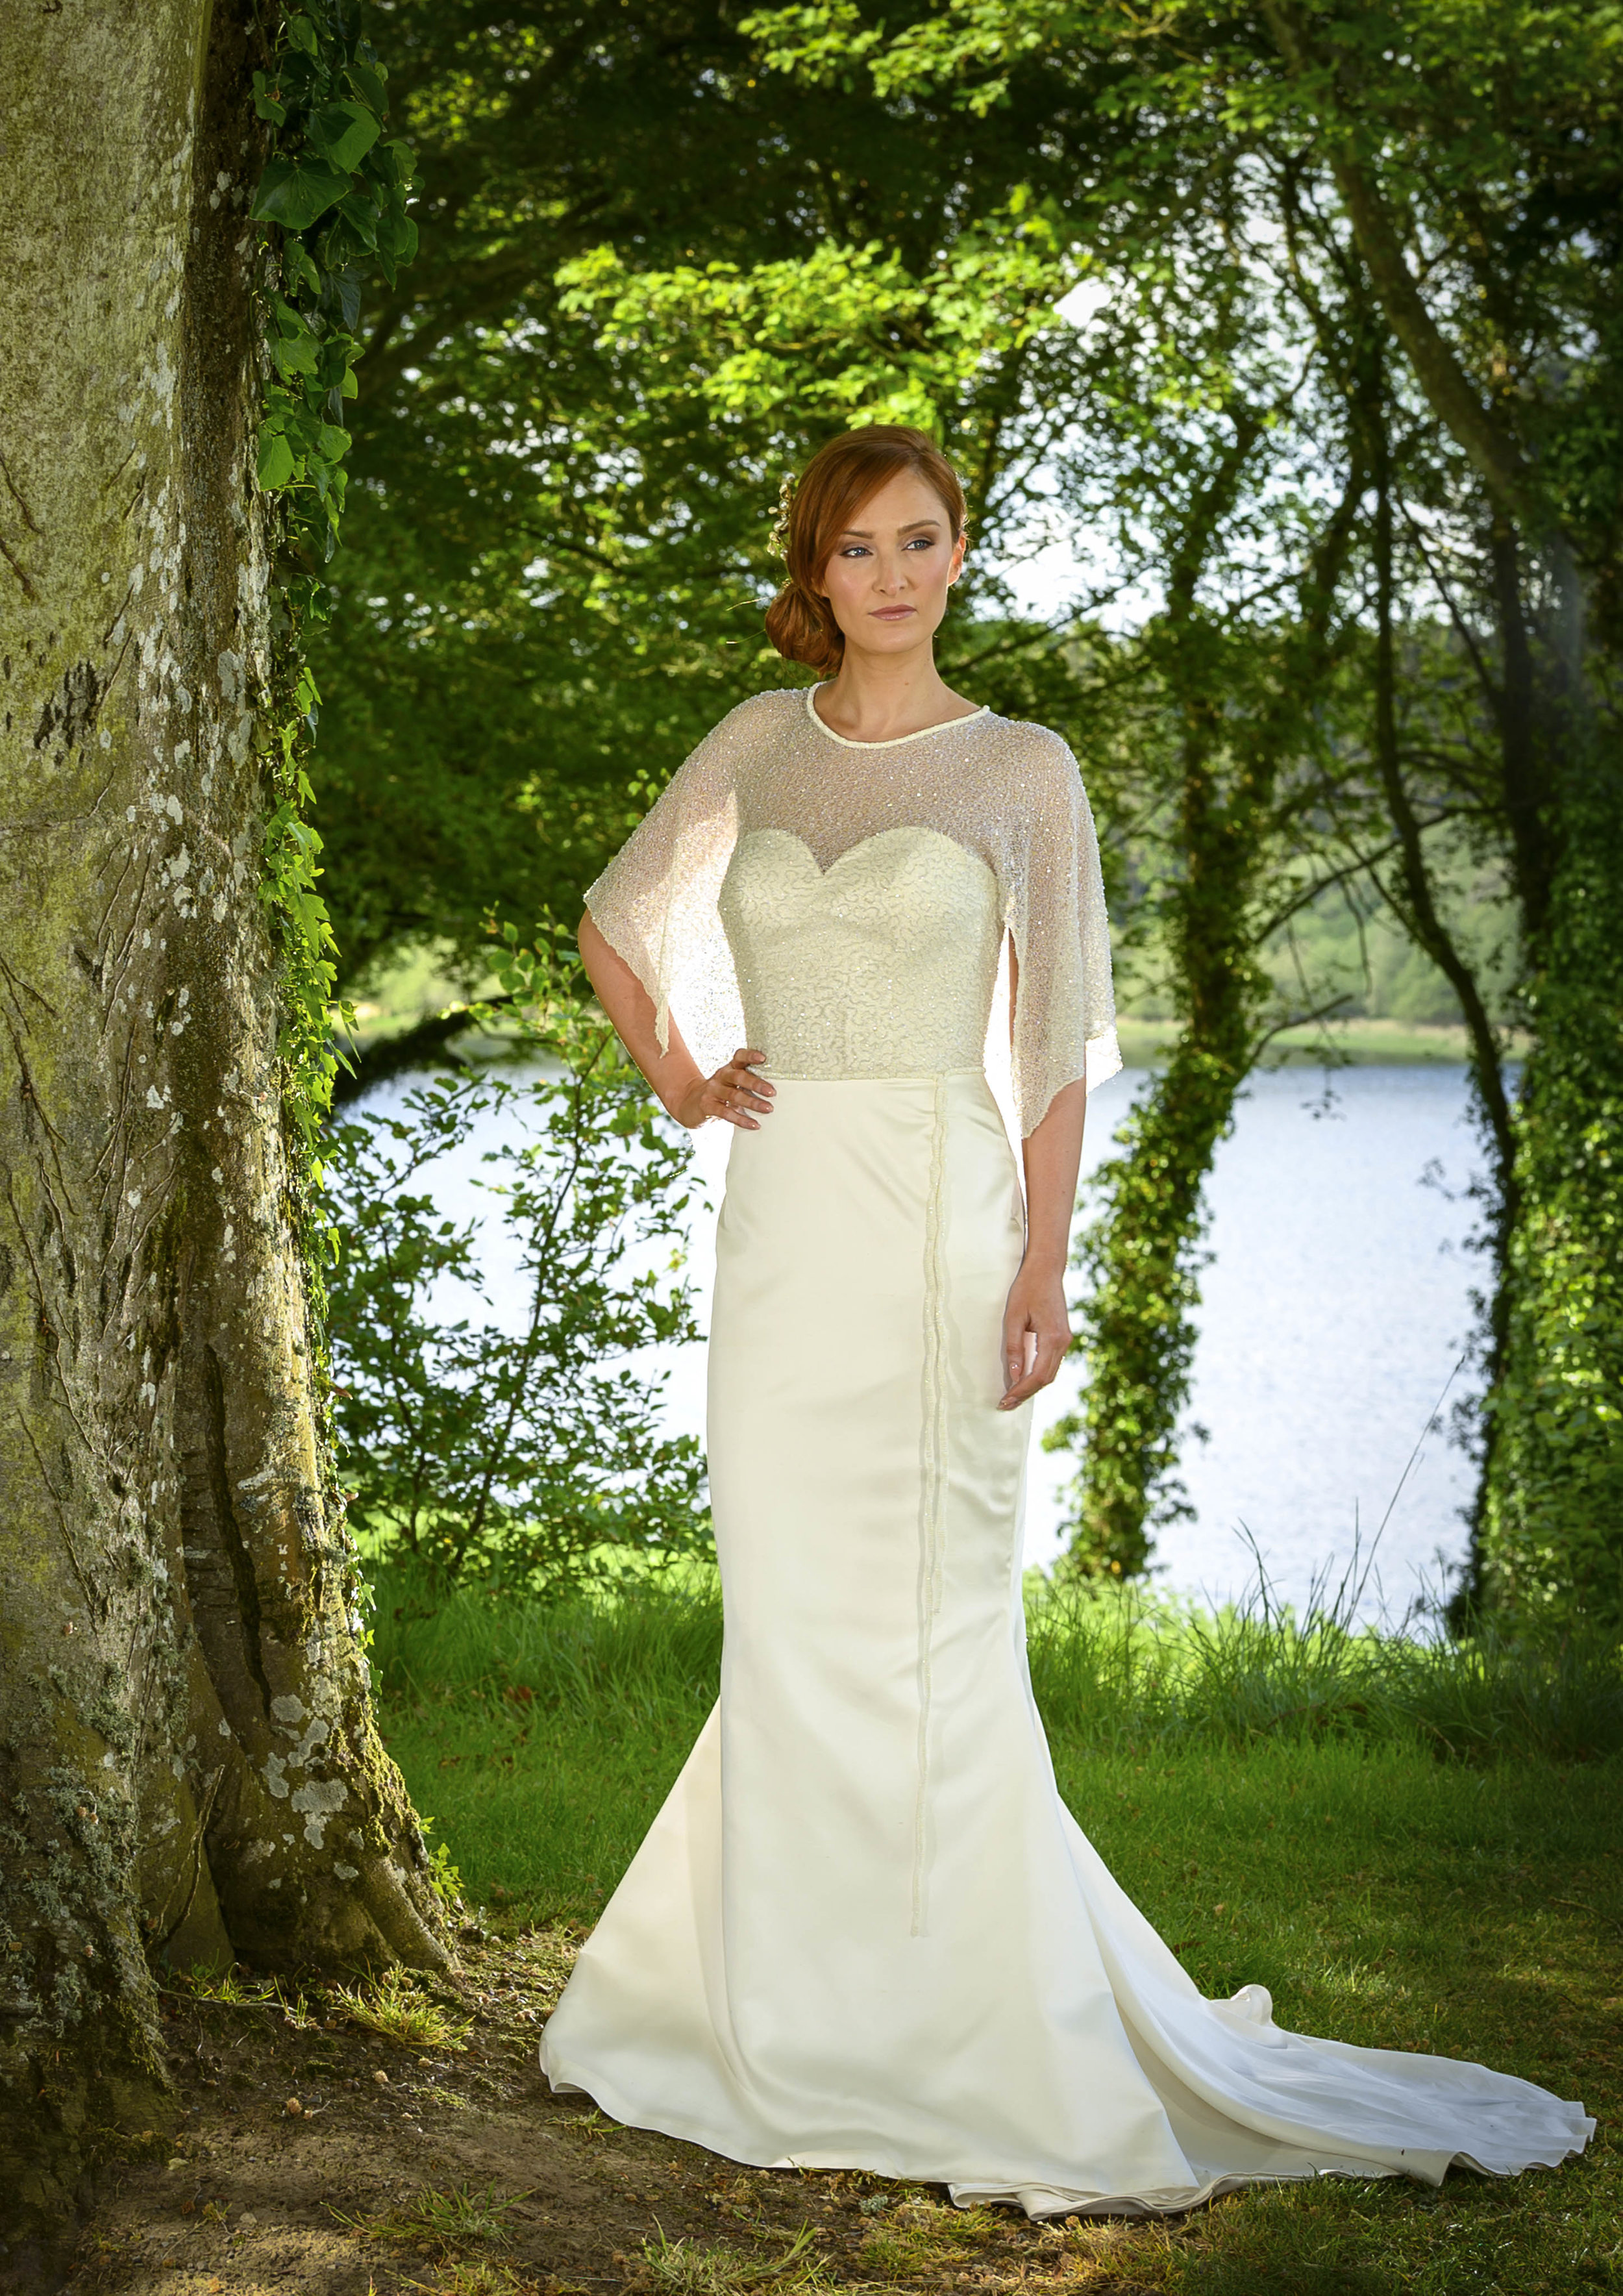 Irish Wedding Diary Tulfarris Photoshoot 15.jpg